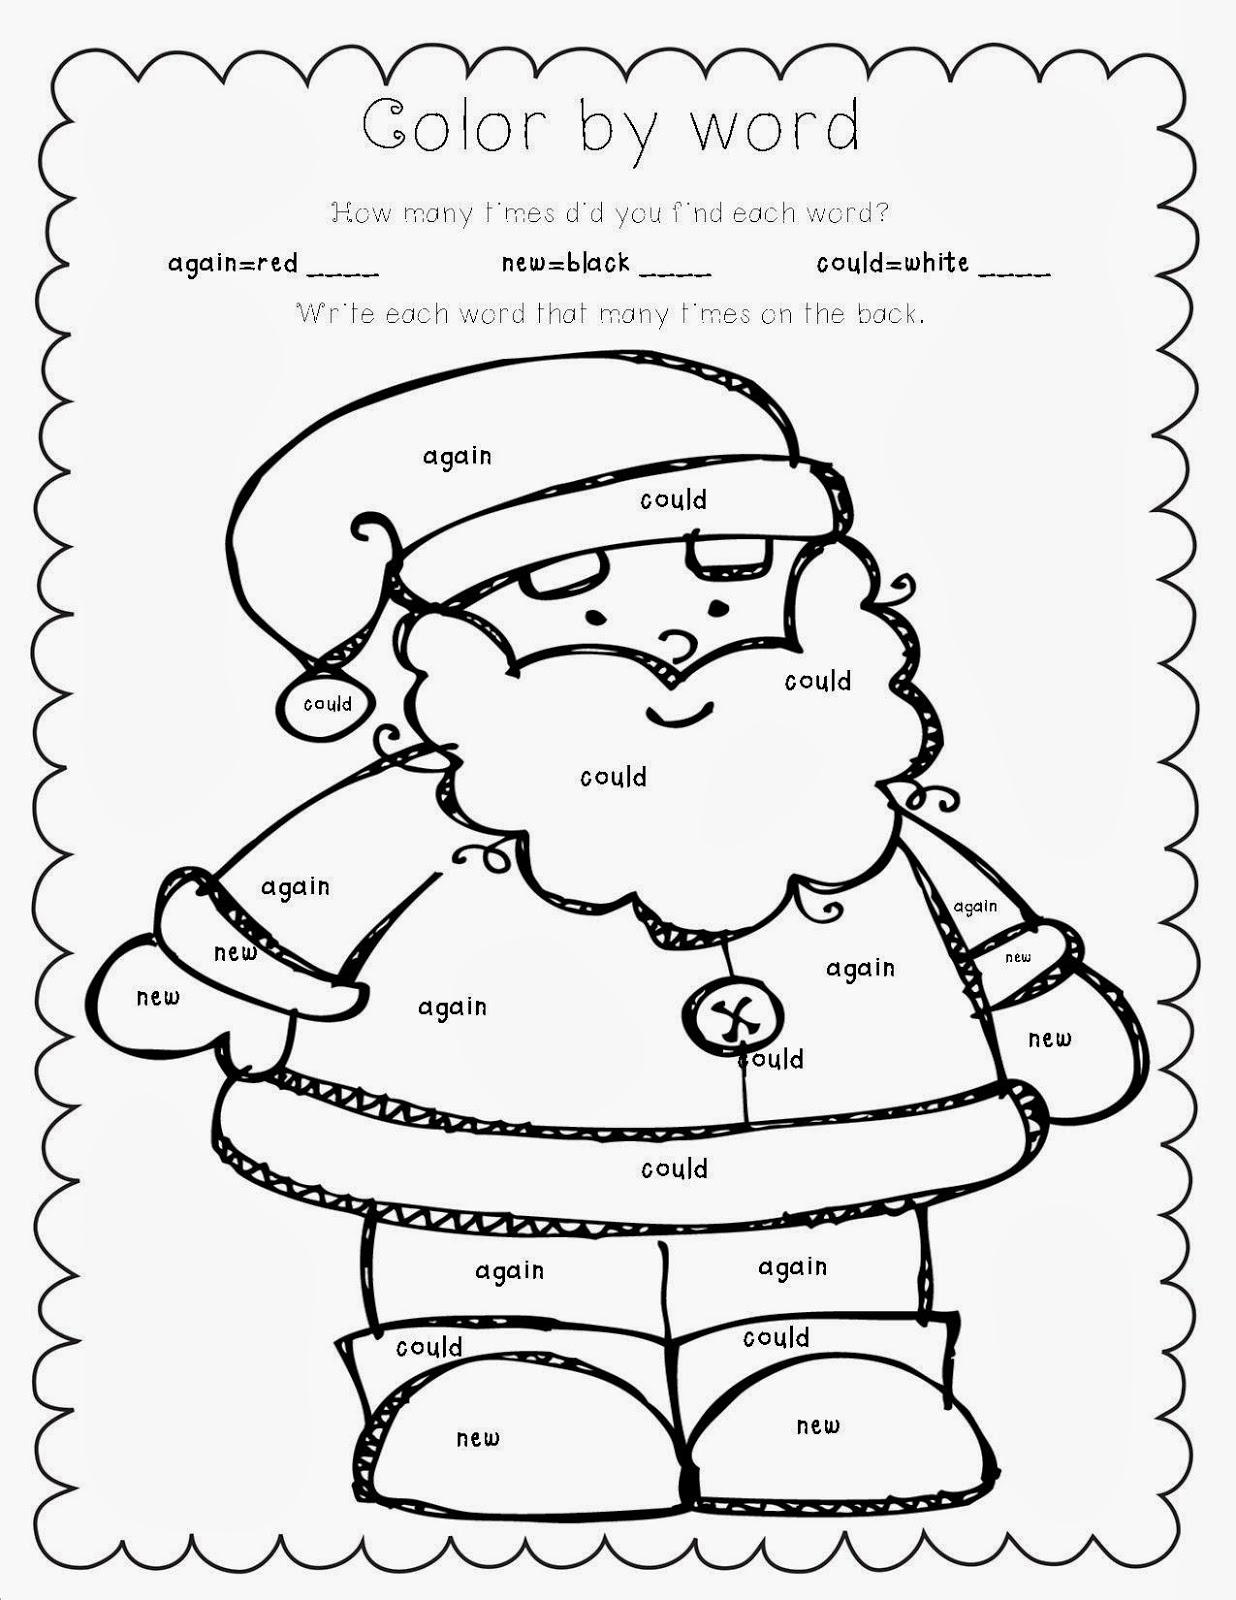 Mrs bohatys kindergarten kingdom monday december 9 2013 ccuart Images